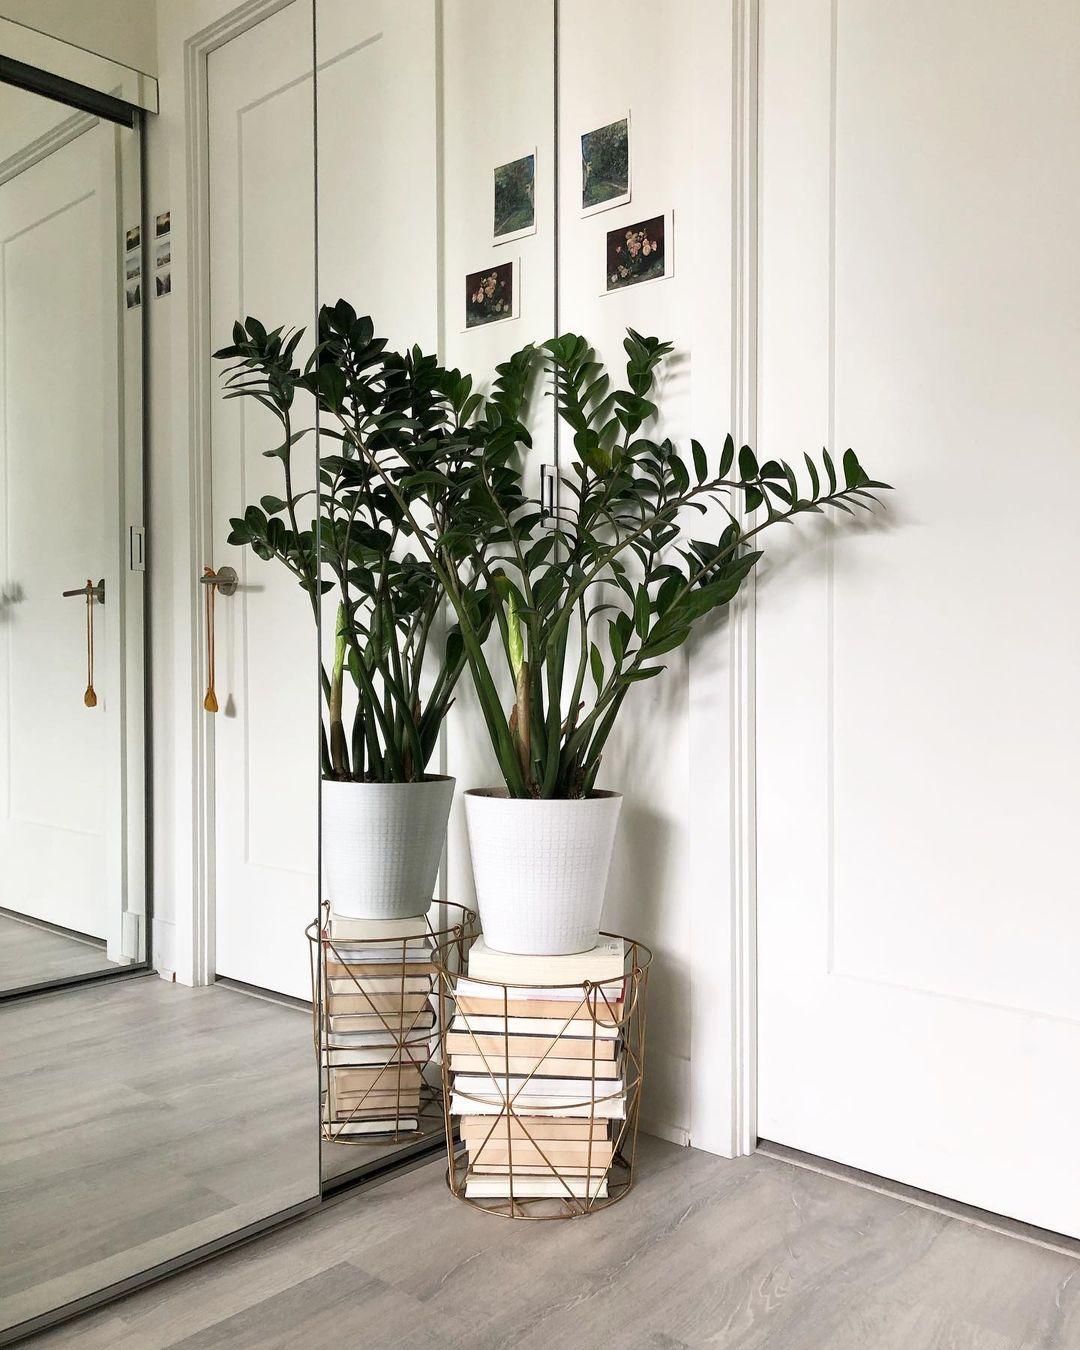 Plantasfaitful-blog-zamioculca-zamiifolia-20-11-2020